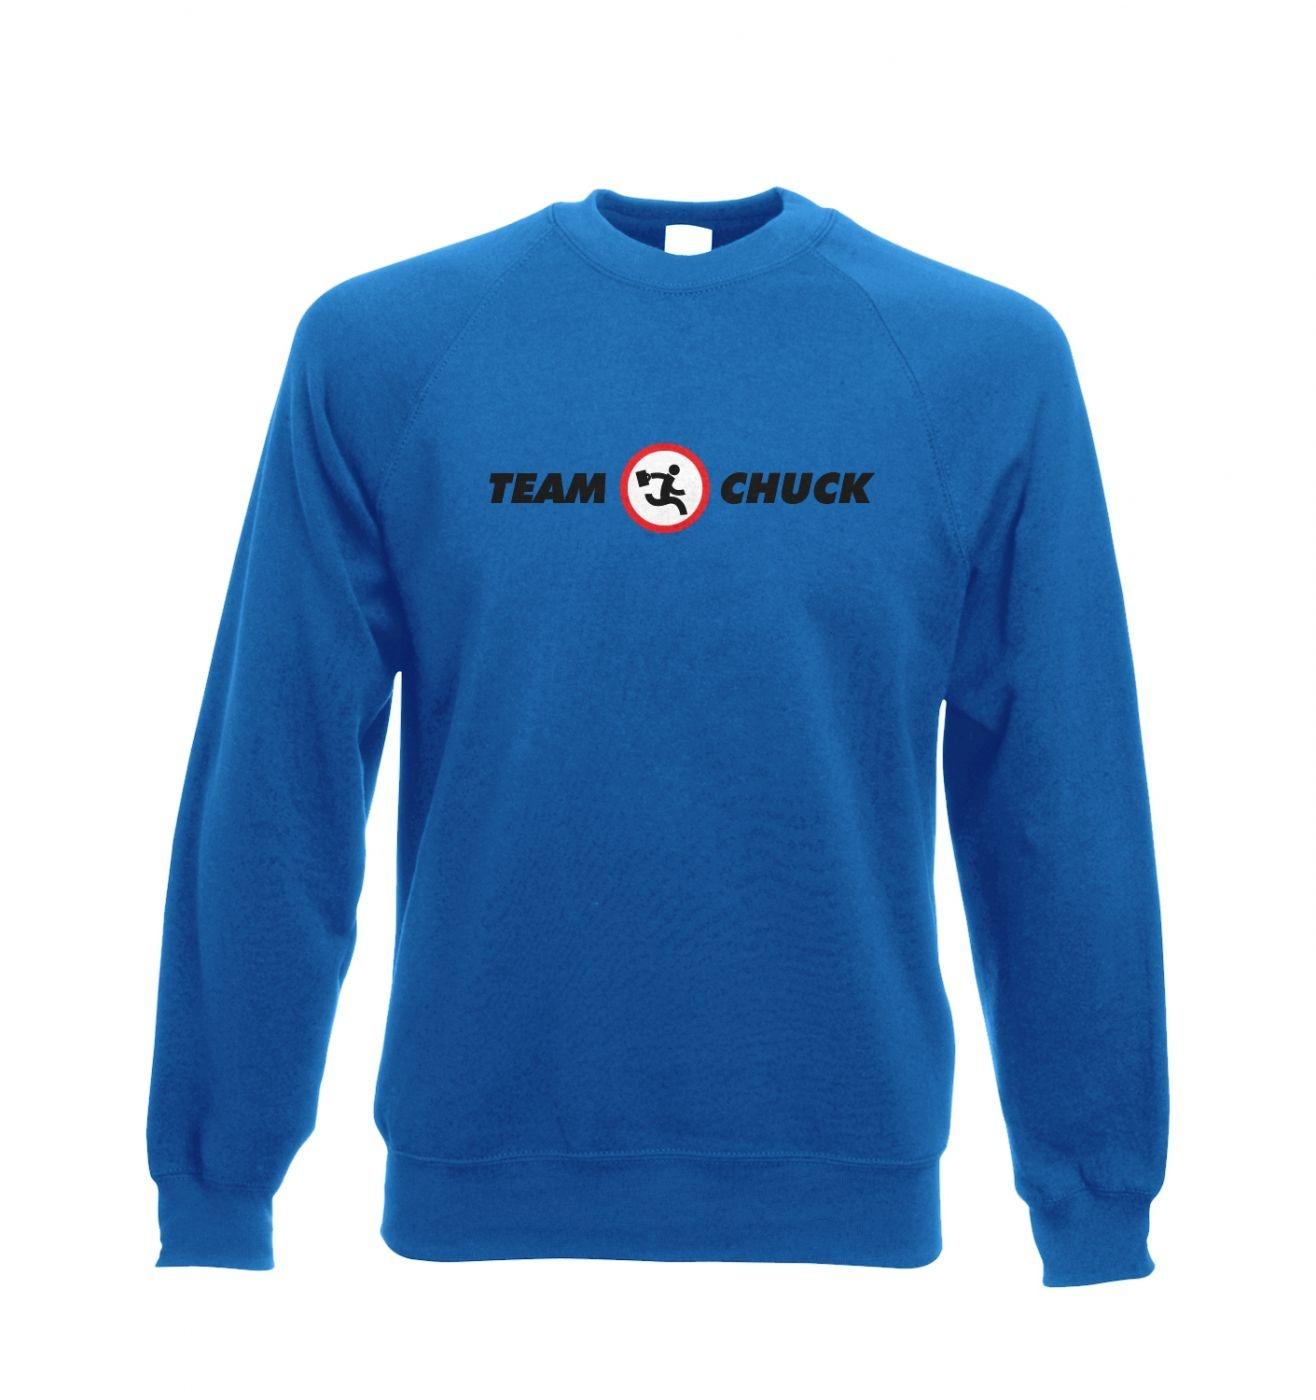 Team Chuck Adult crewneck sweatshirt